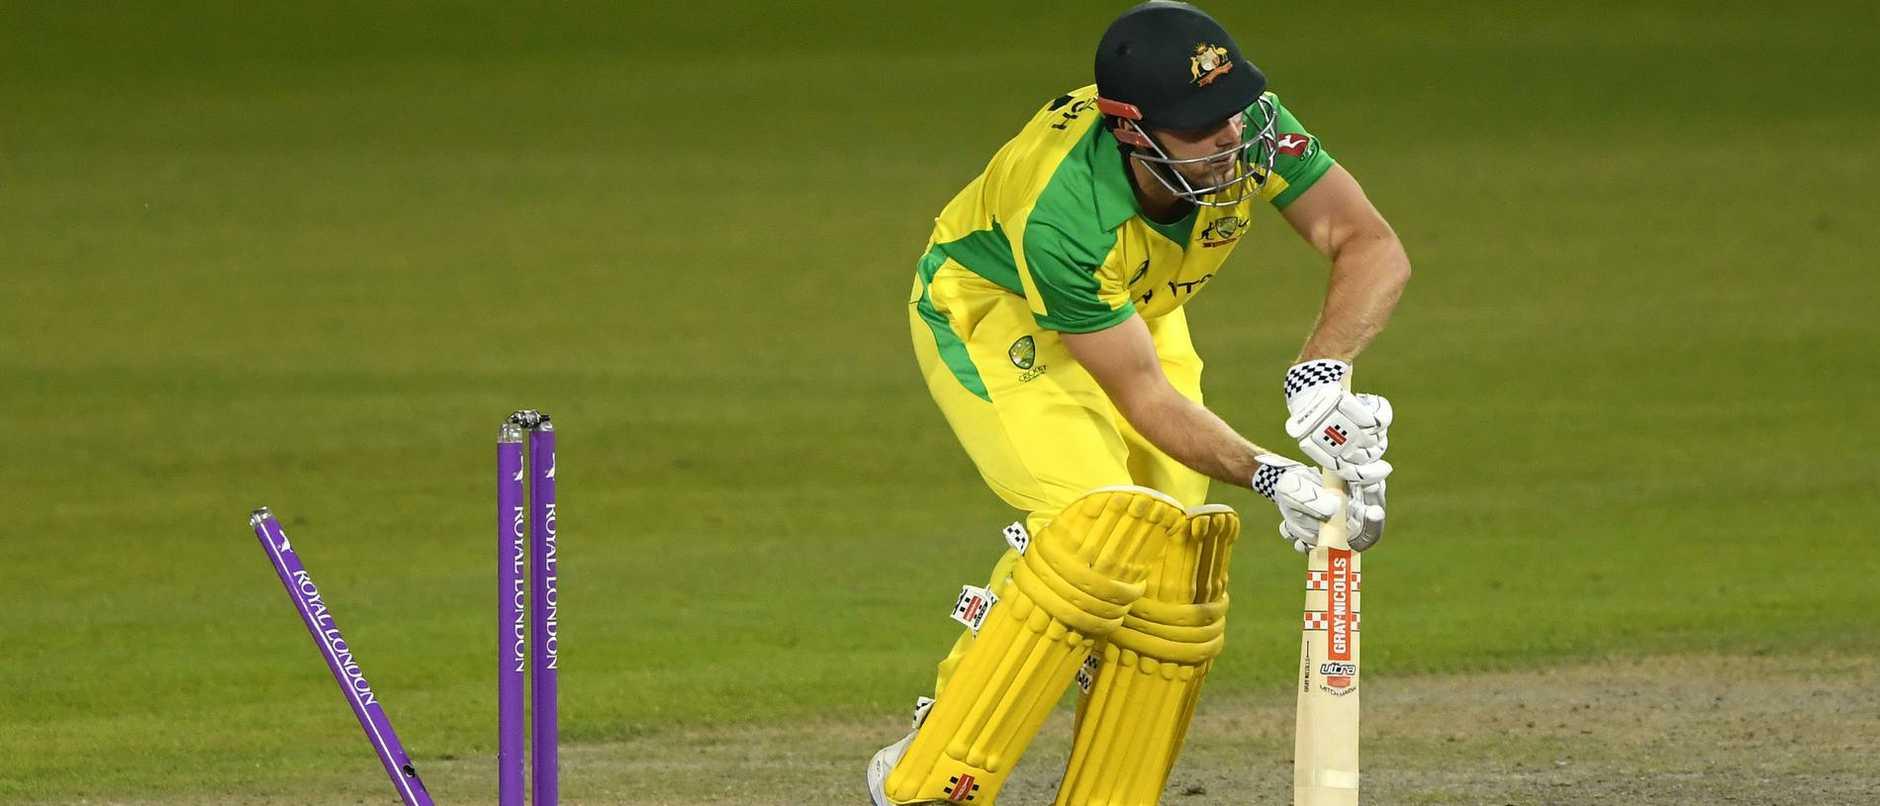 England v Australia - 2nd Royal London Series One Day International